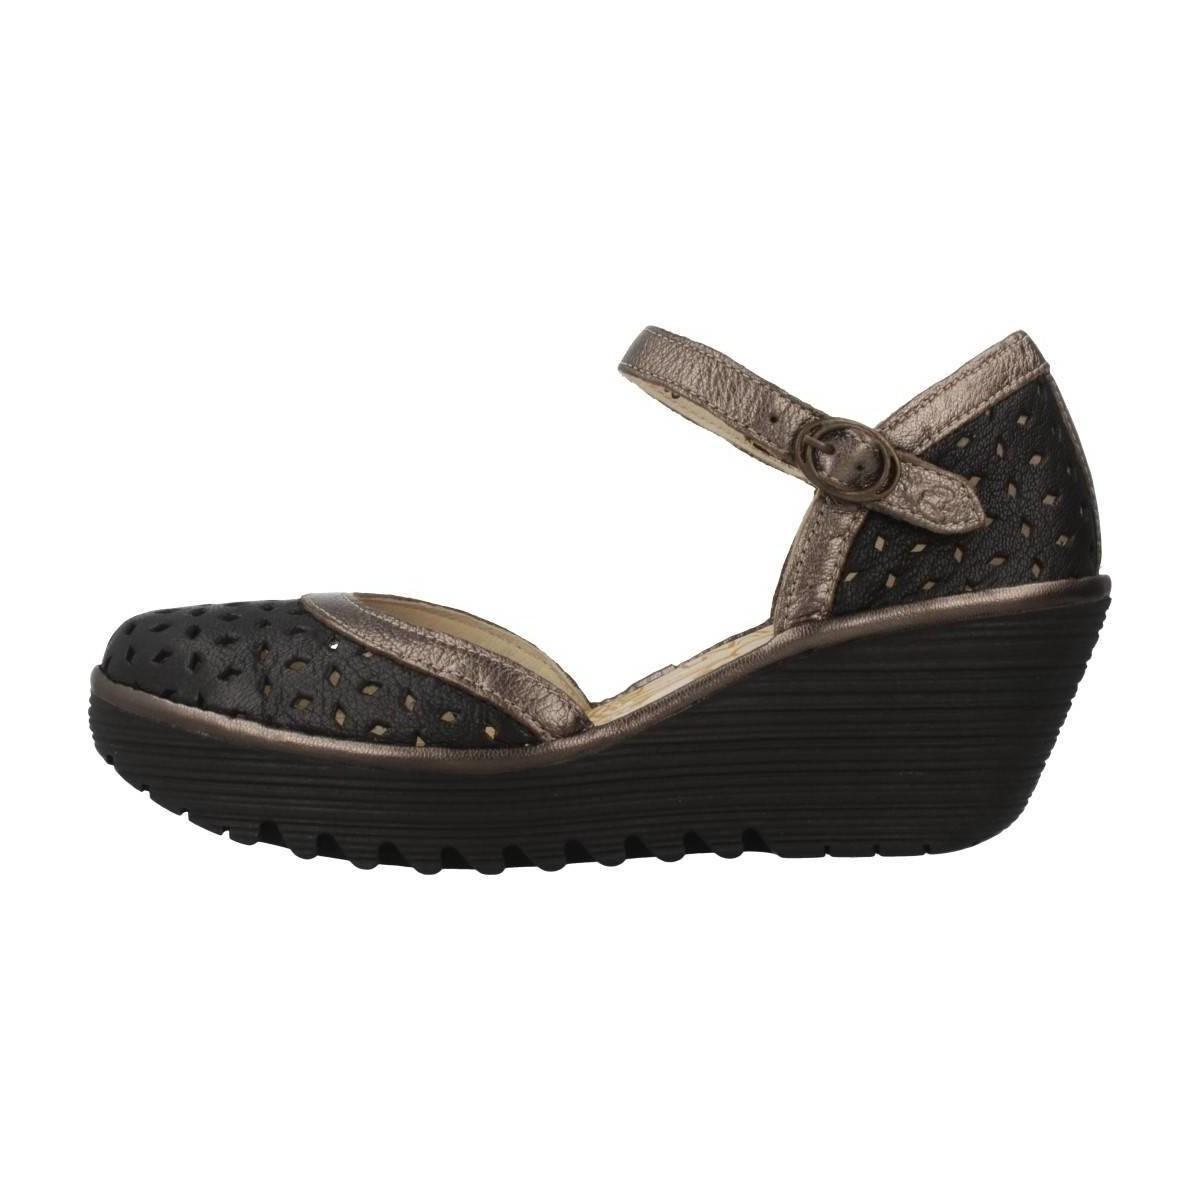 f794f2e151 Fly London P501029007 Women's Shoes (pumps / Ballerinas) In Black in ...